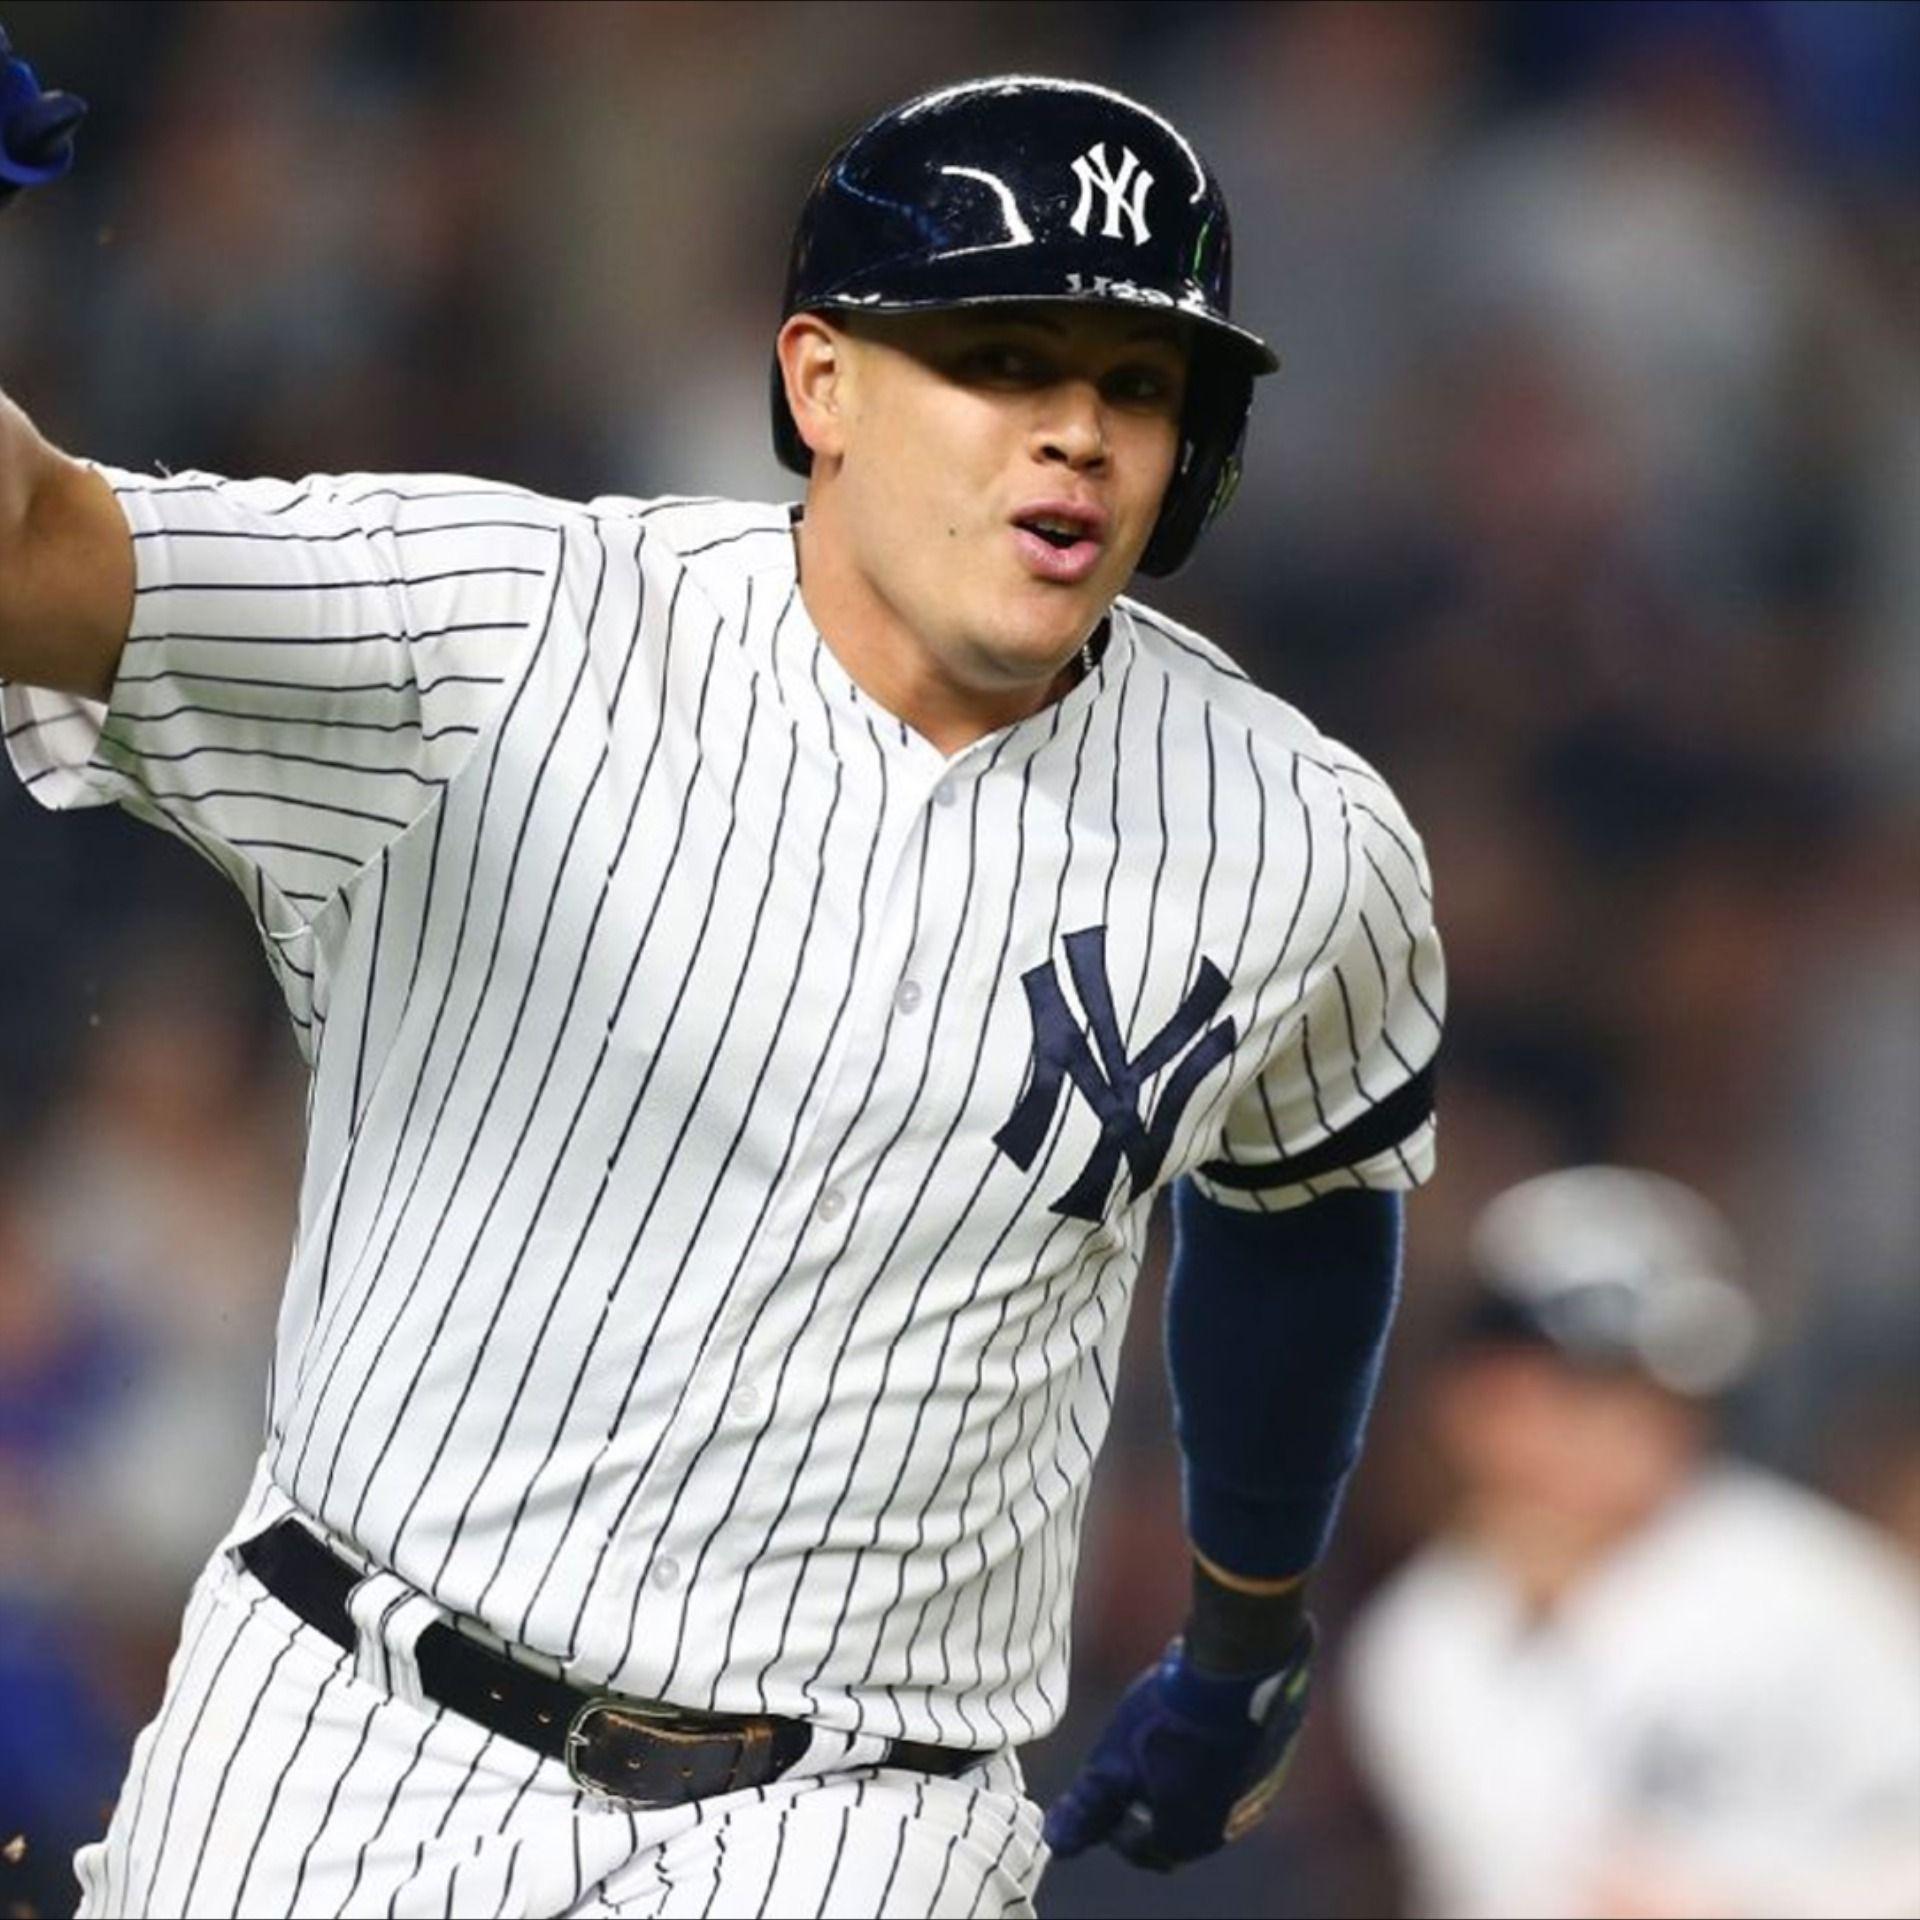 Gio Urshela Infielder New York Yankees In 2020 New York Yankees Yankees Yankees Baseball